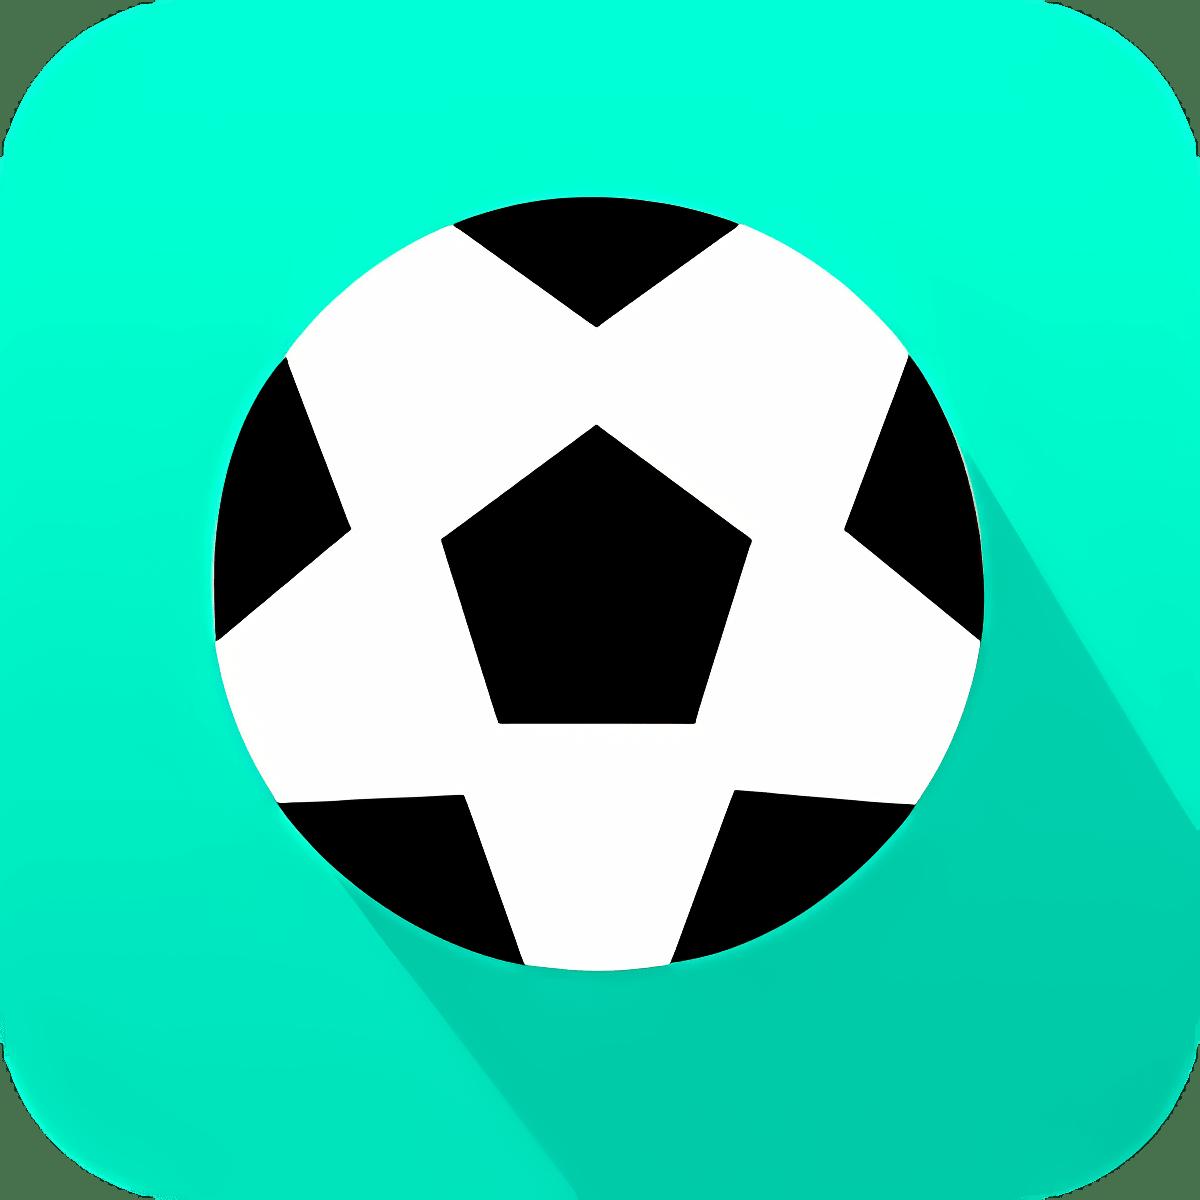 Trick Ball (Fútbol)